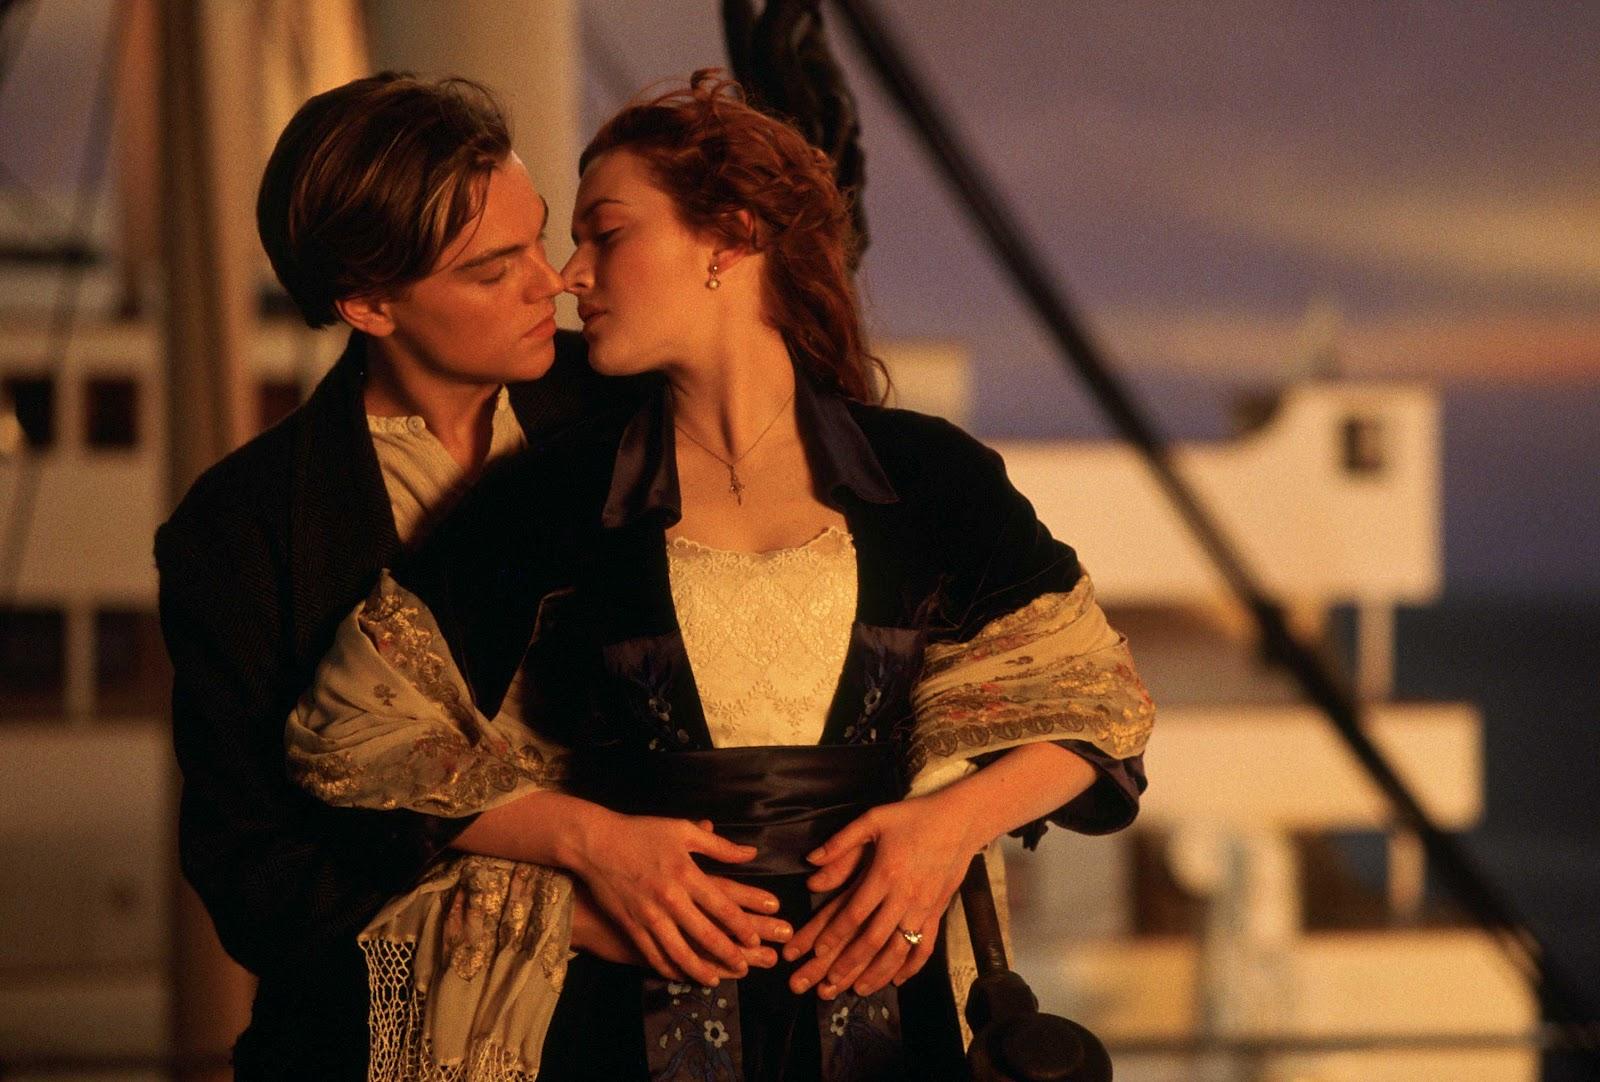 rose dewitt bukater | james cameron's titanic wiki | fandom powered